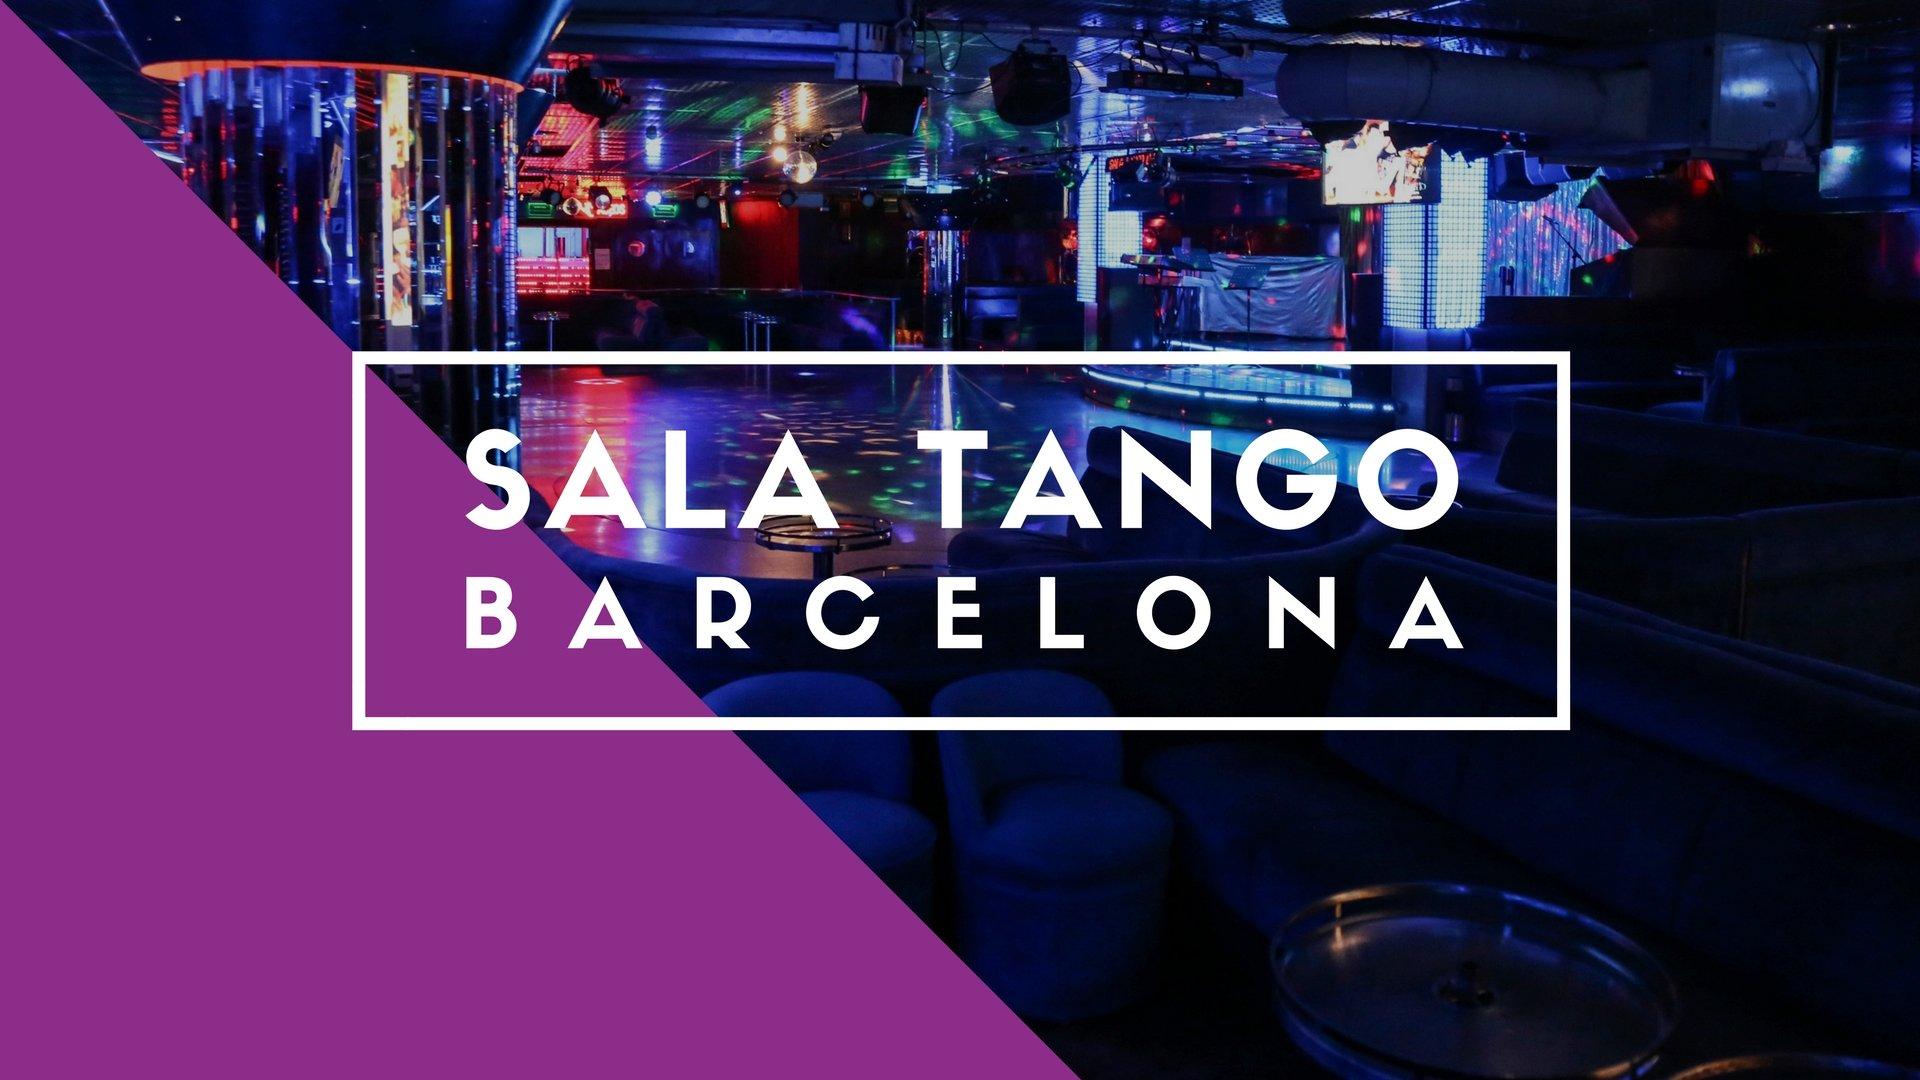 Sala Tango, Barcelona